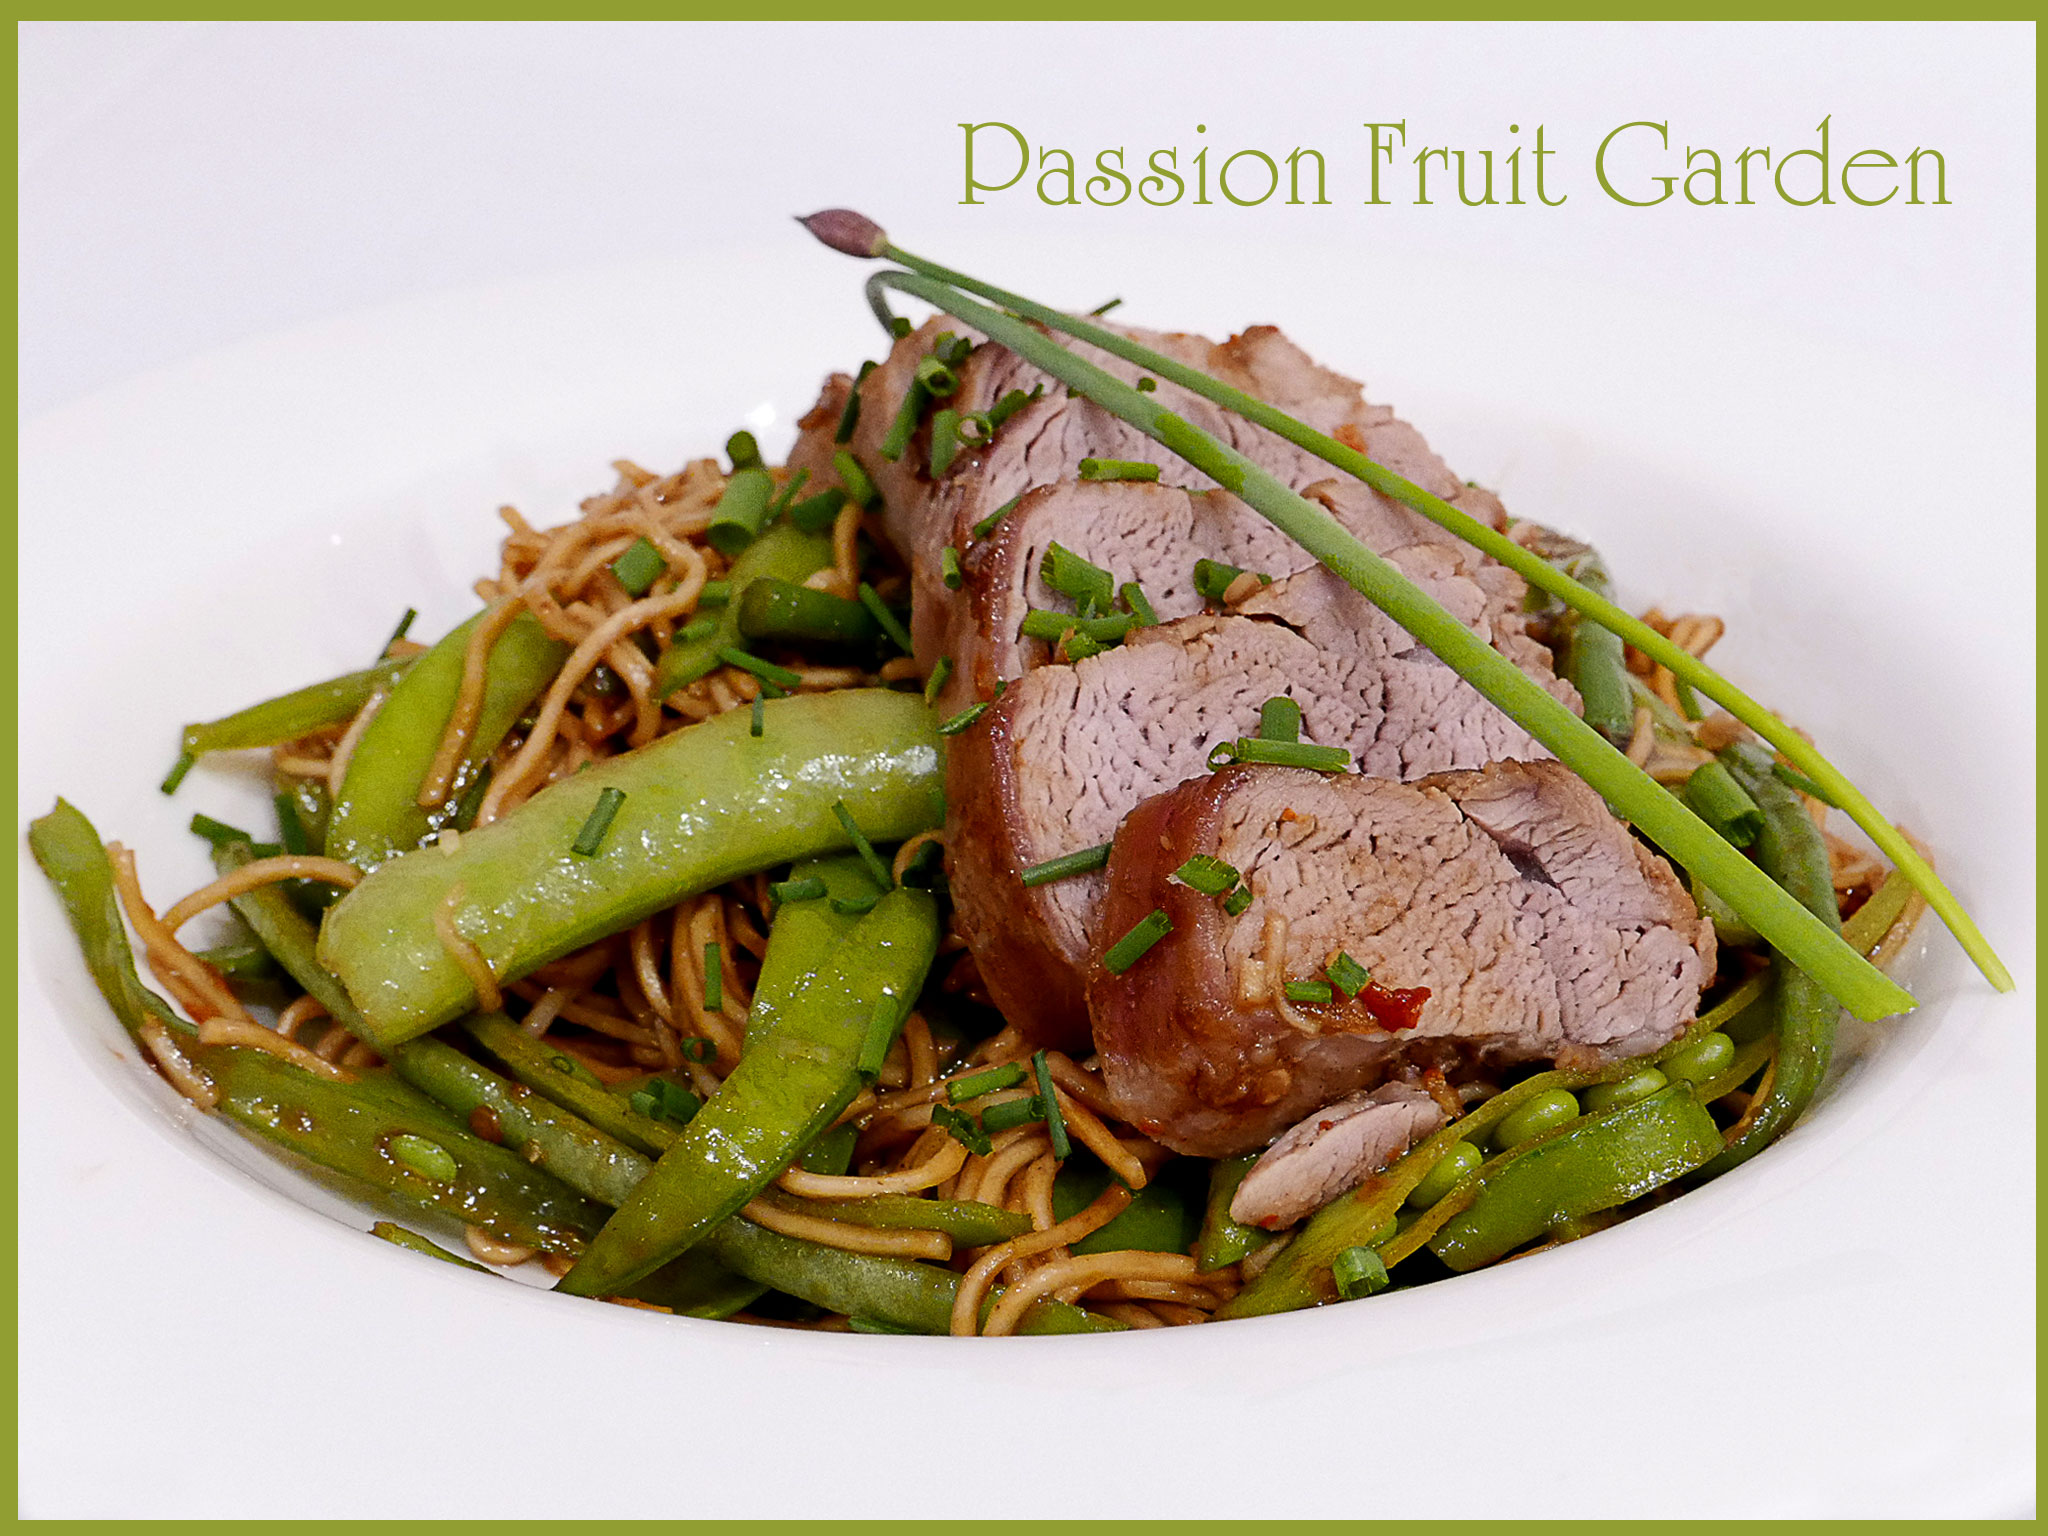 Hoisin pork with beans, snow peas and noodles | Passion Fruit Garden